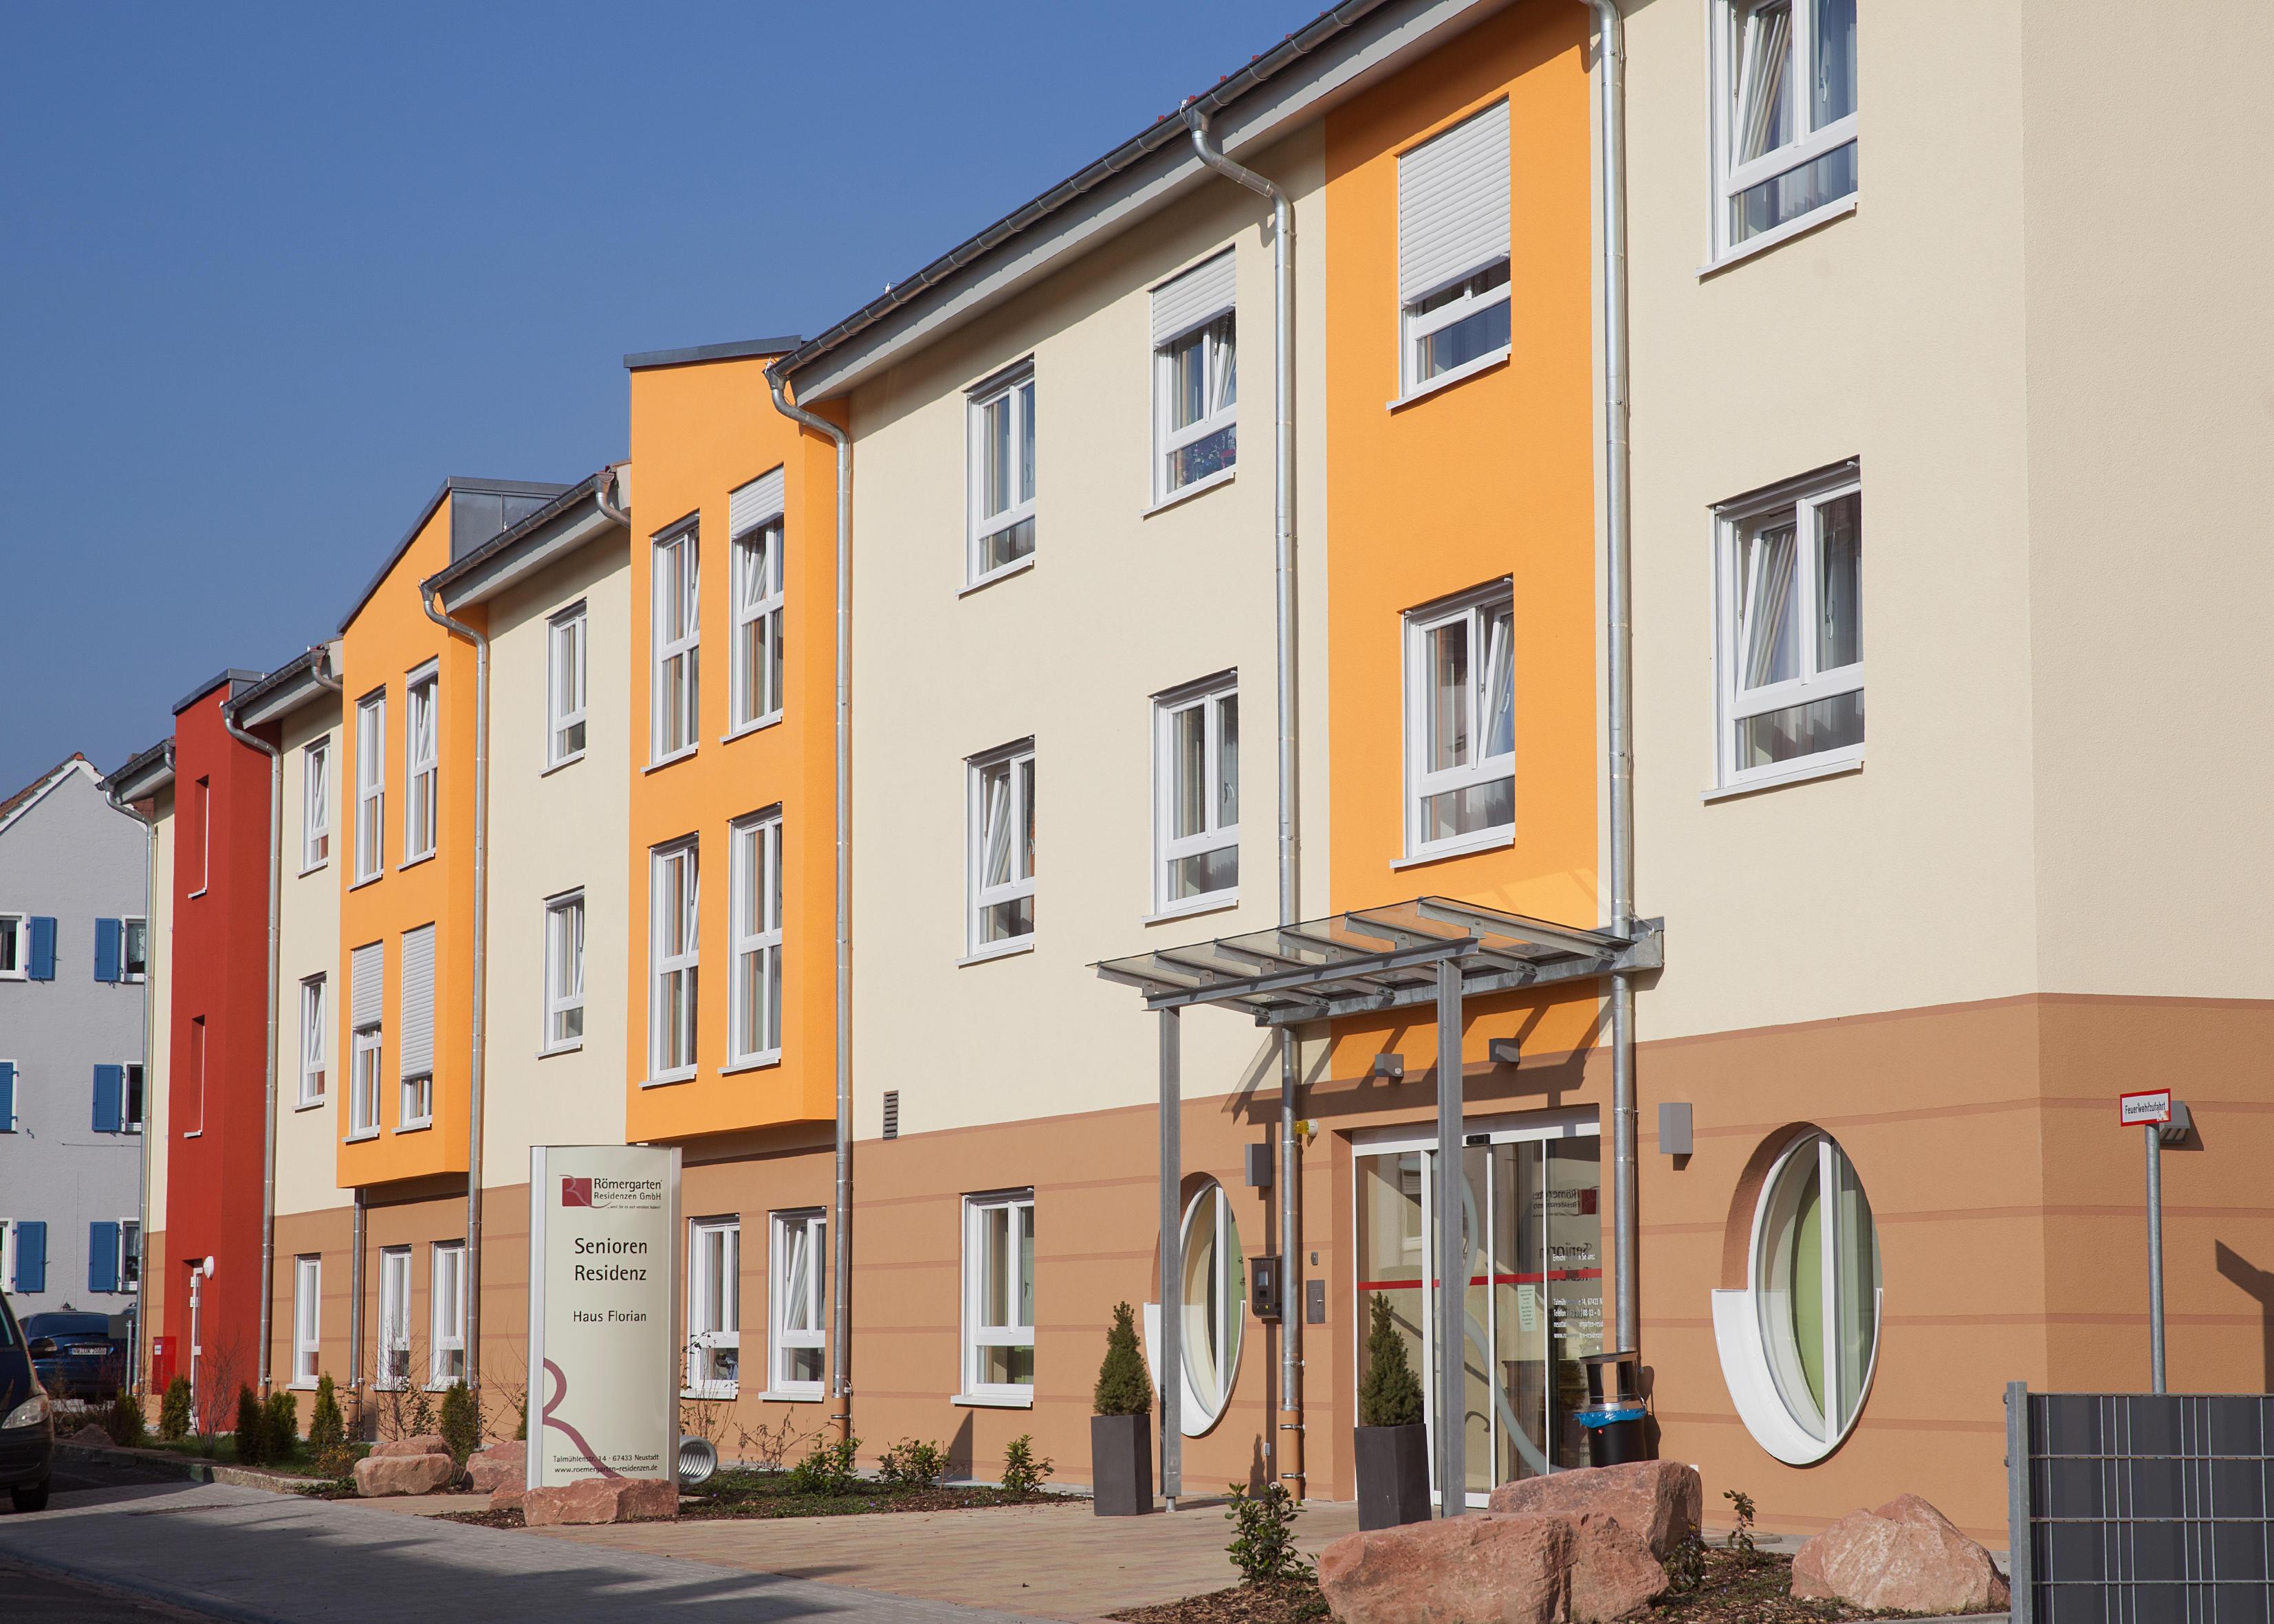 R�mergarten Residenzen Haus Florian